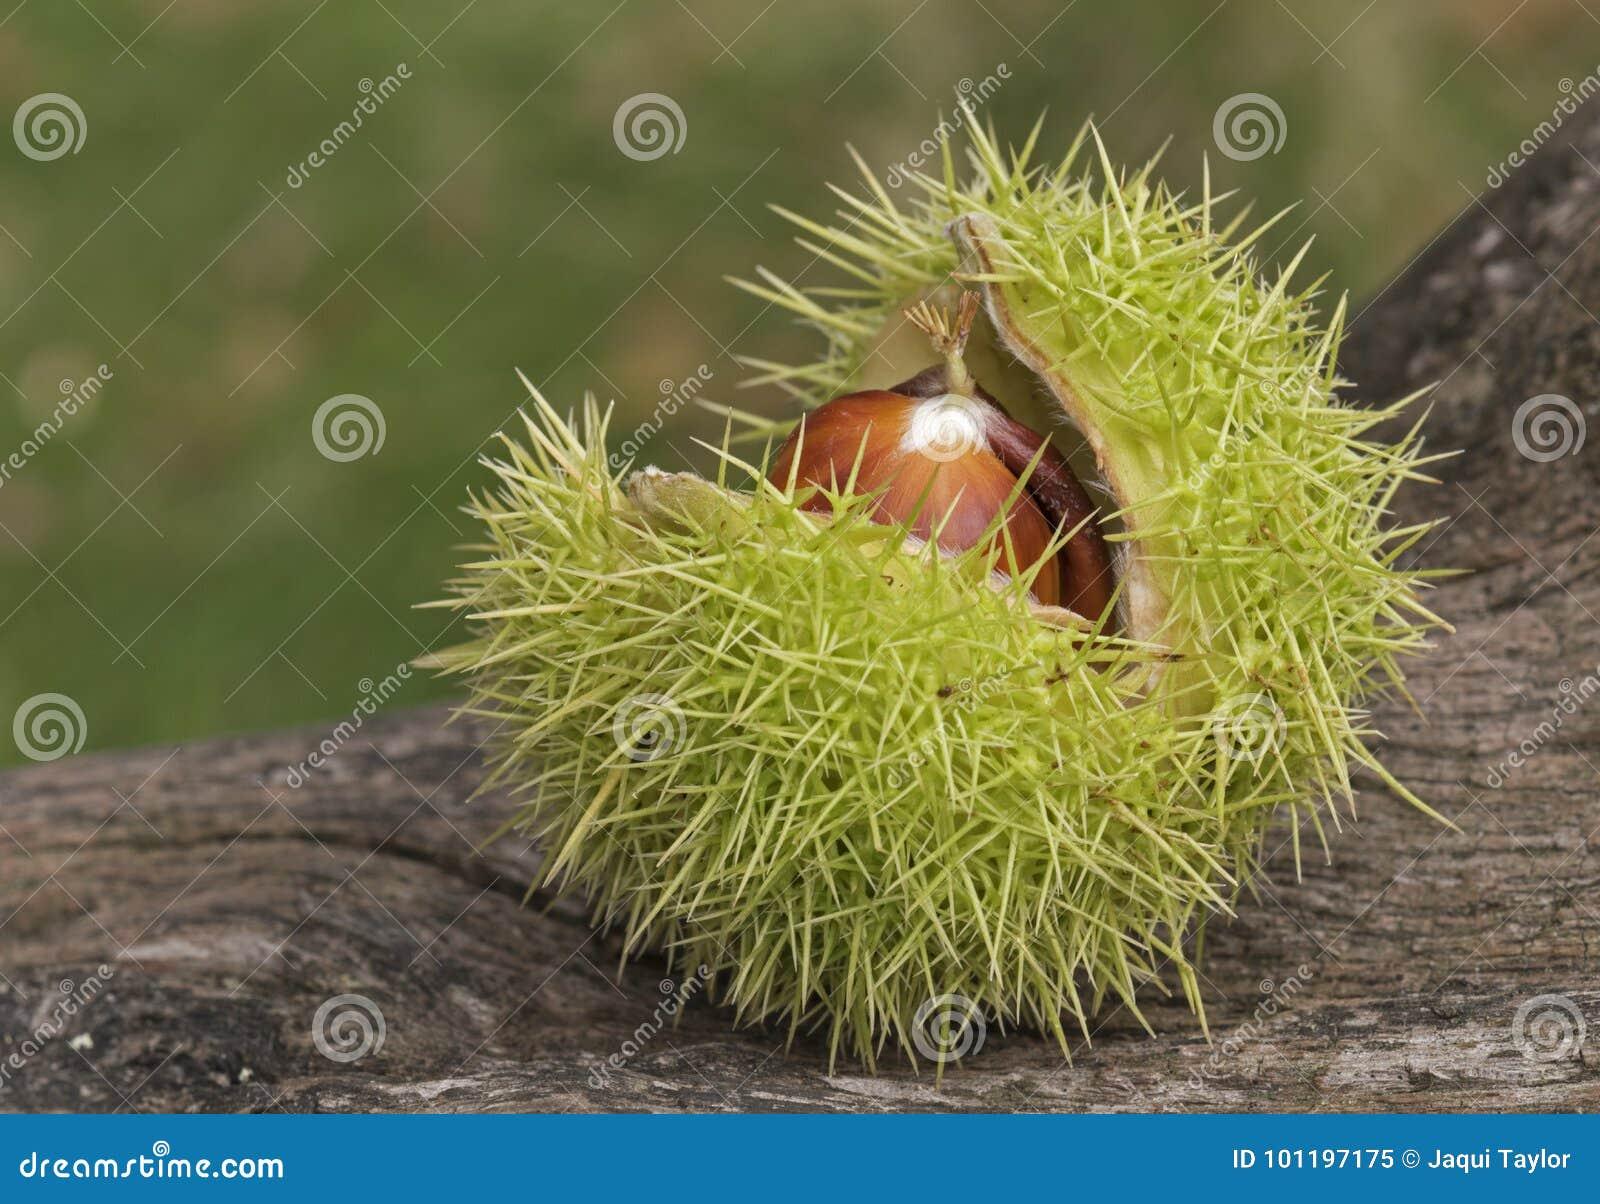 Horse chestnuts in their case